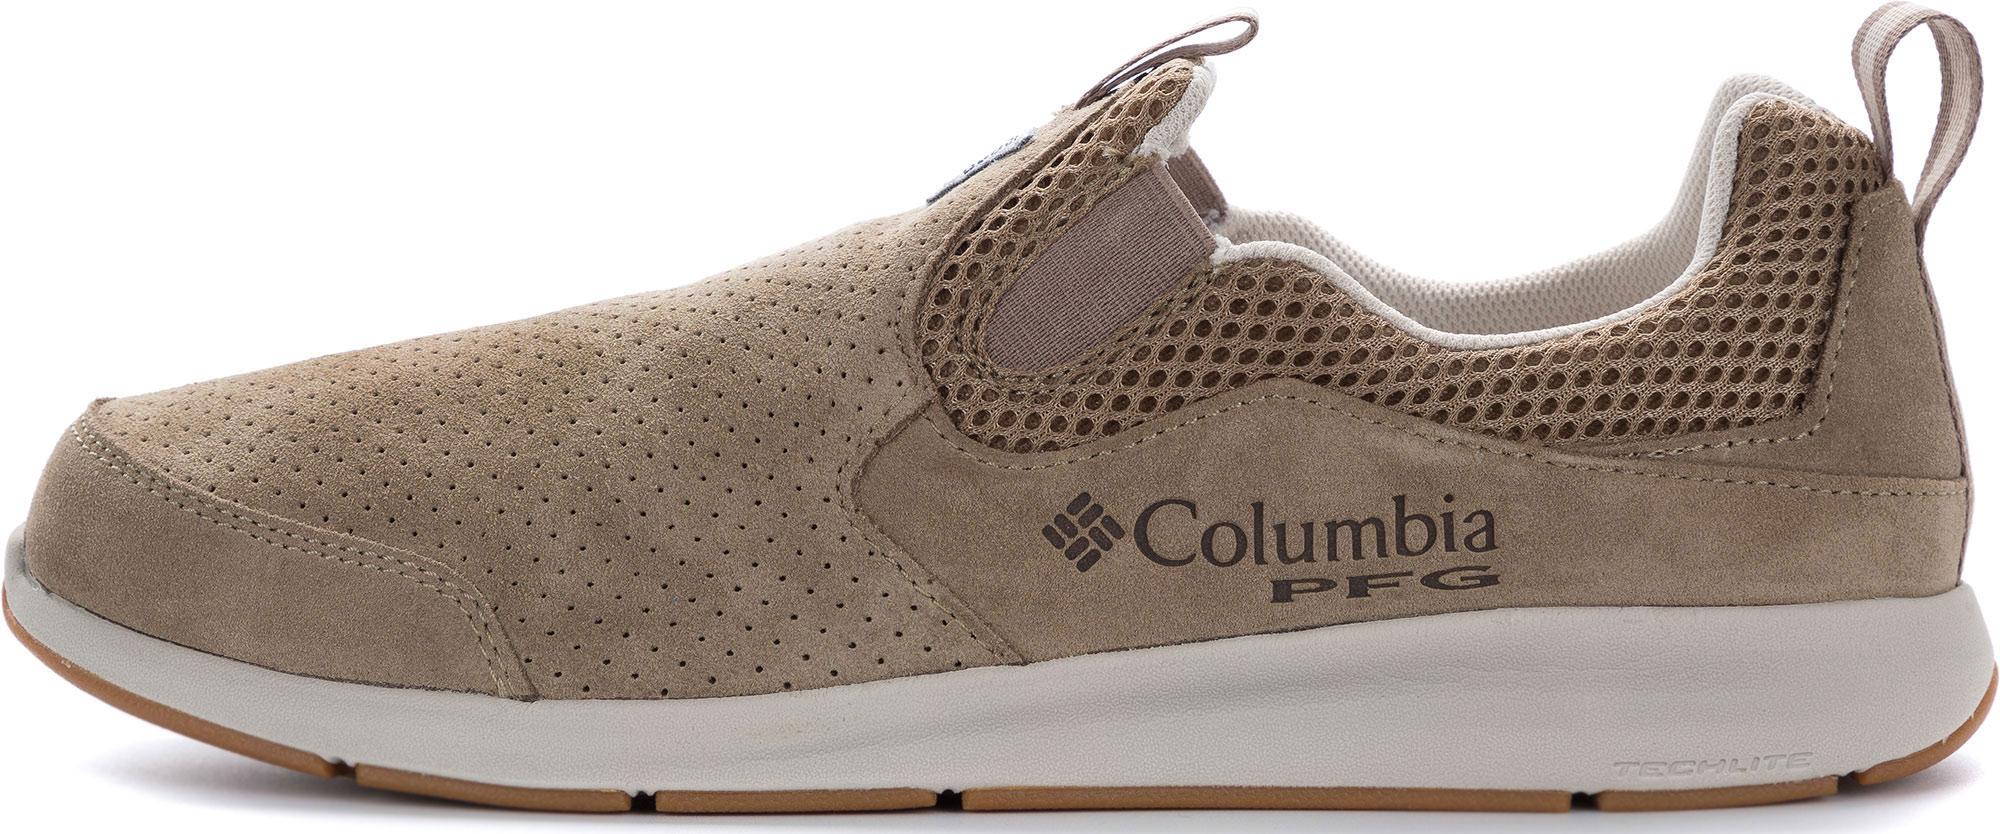 Columbia Полуботинки мужские Brownswood Slip, размер 46,5